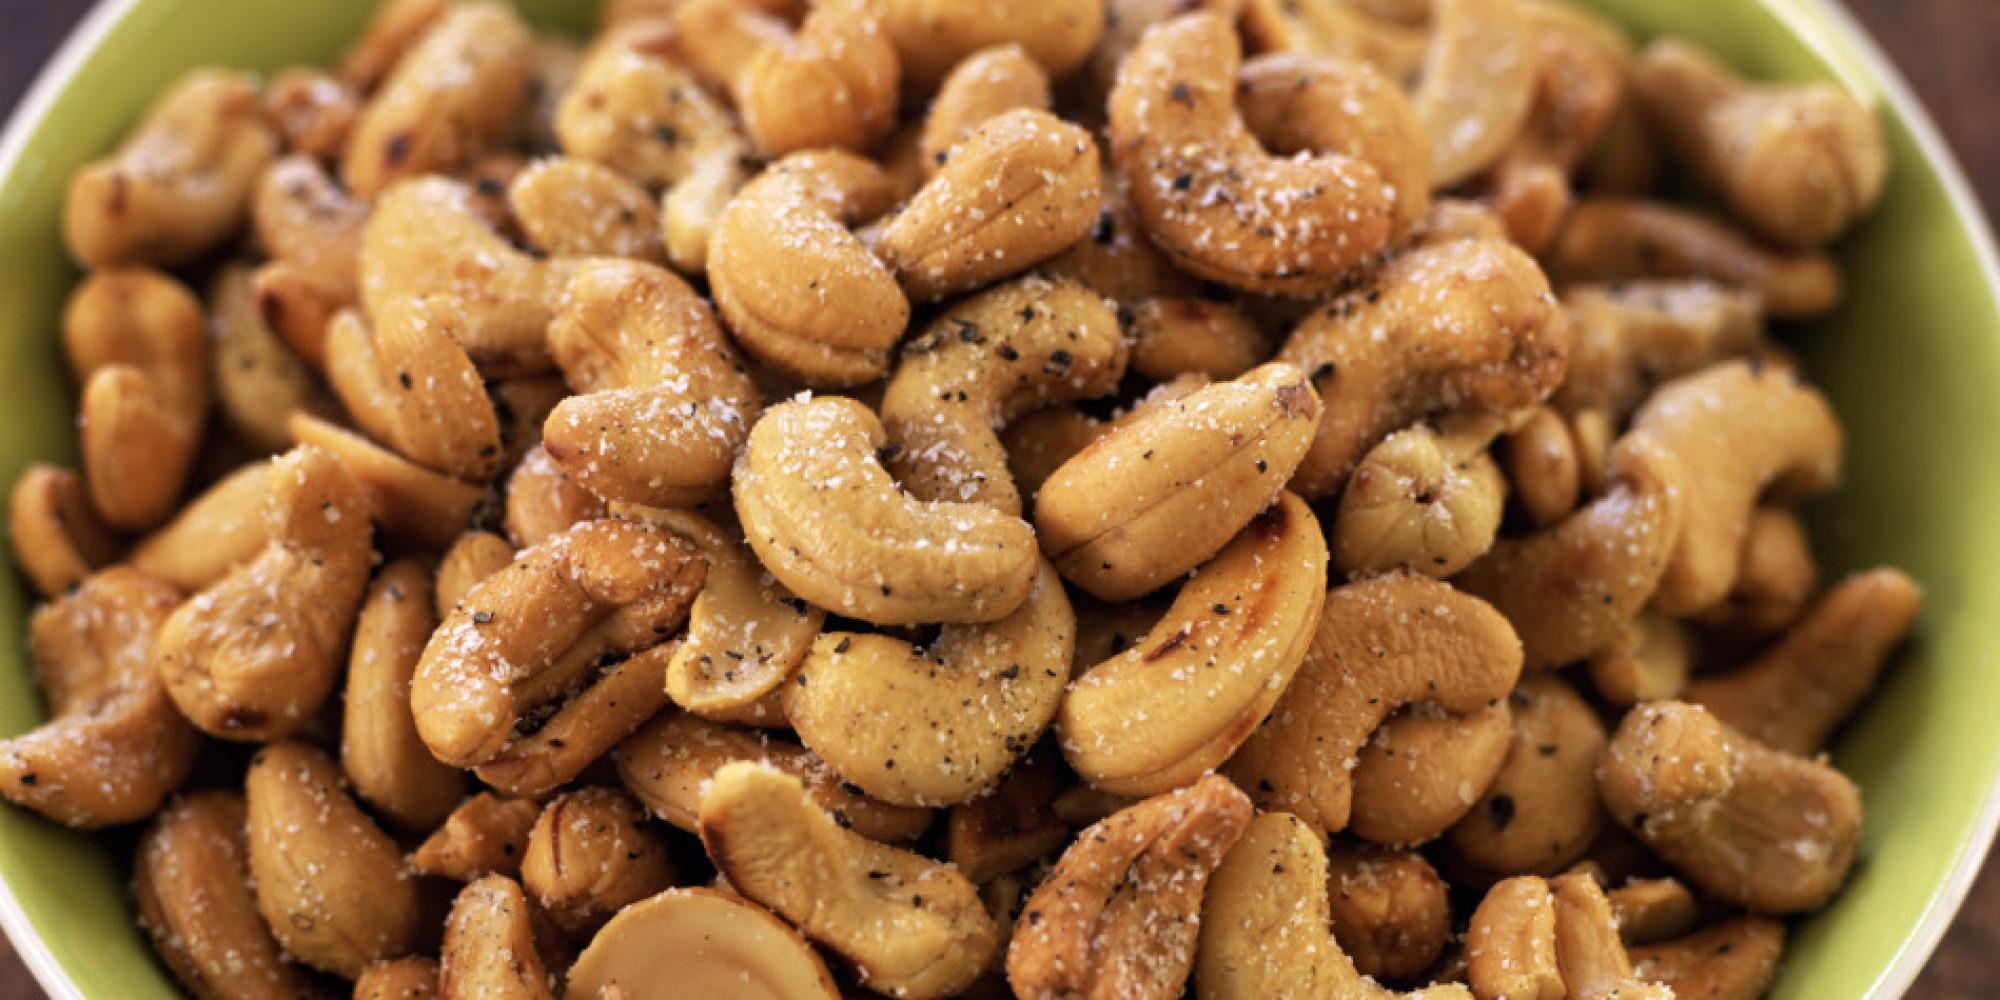 Pretzels Healthy Snack  Healthy Snacks You Should Keep At Your Desk